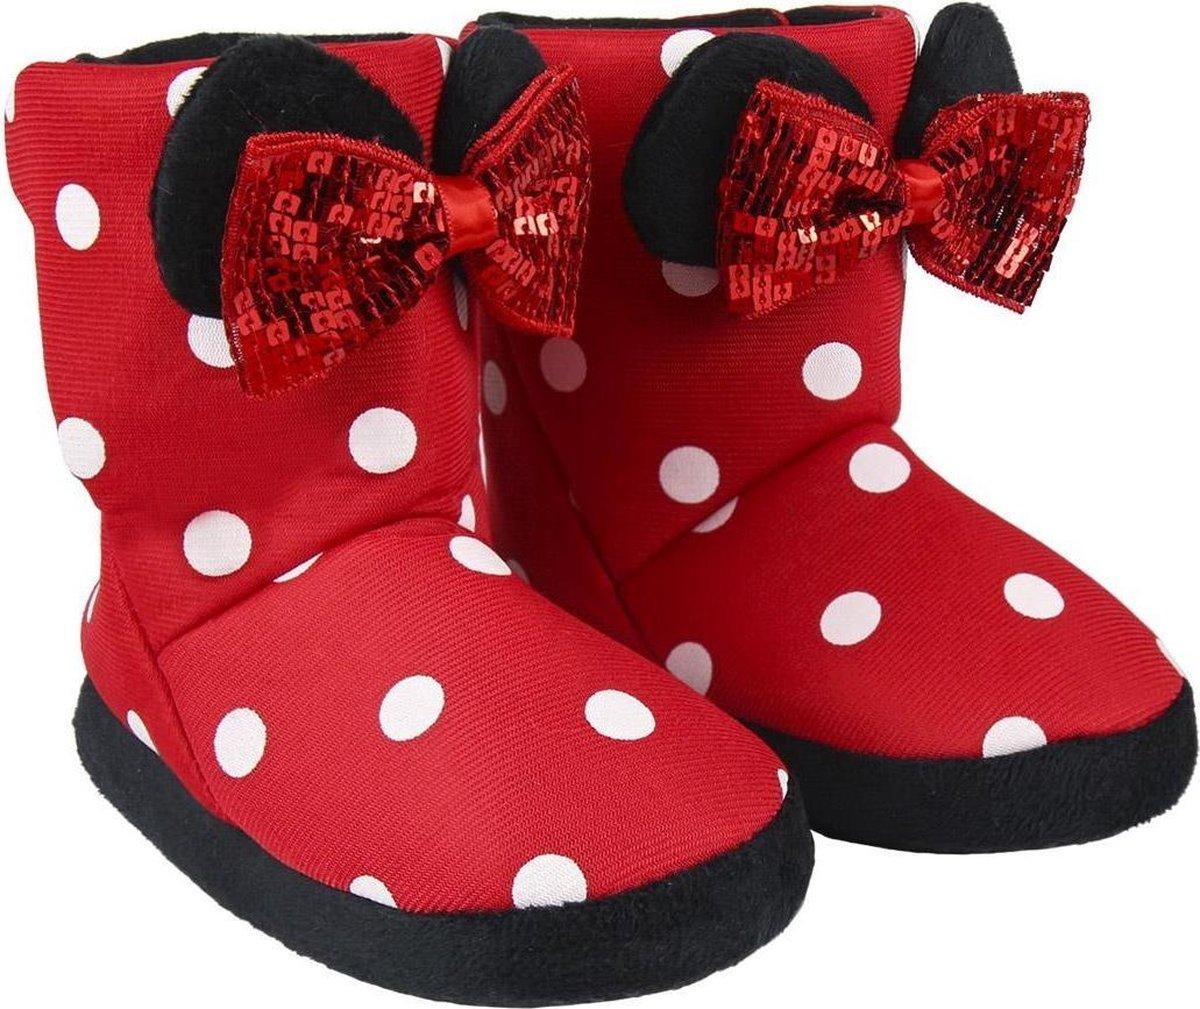 Disney Minnie Mouse - Hoge Sloffen - Rood